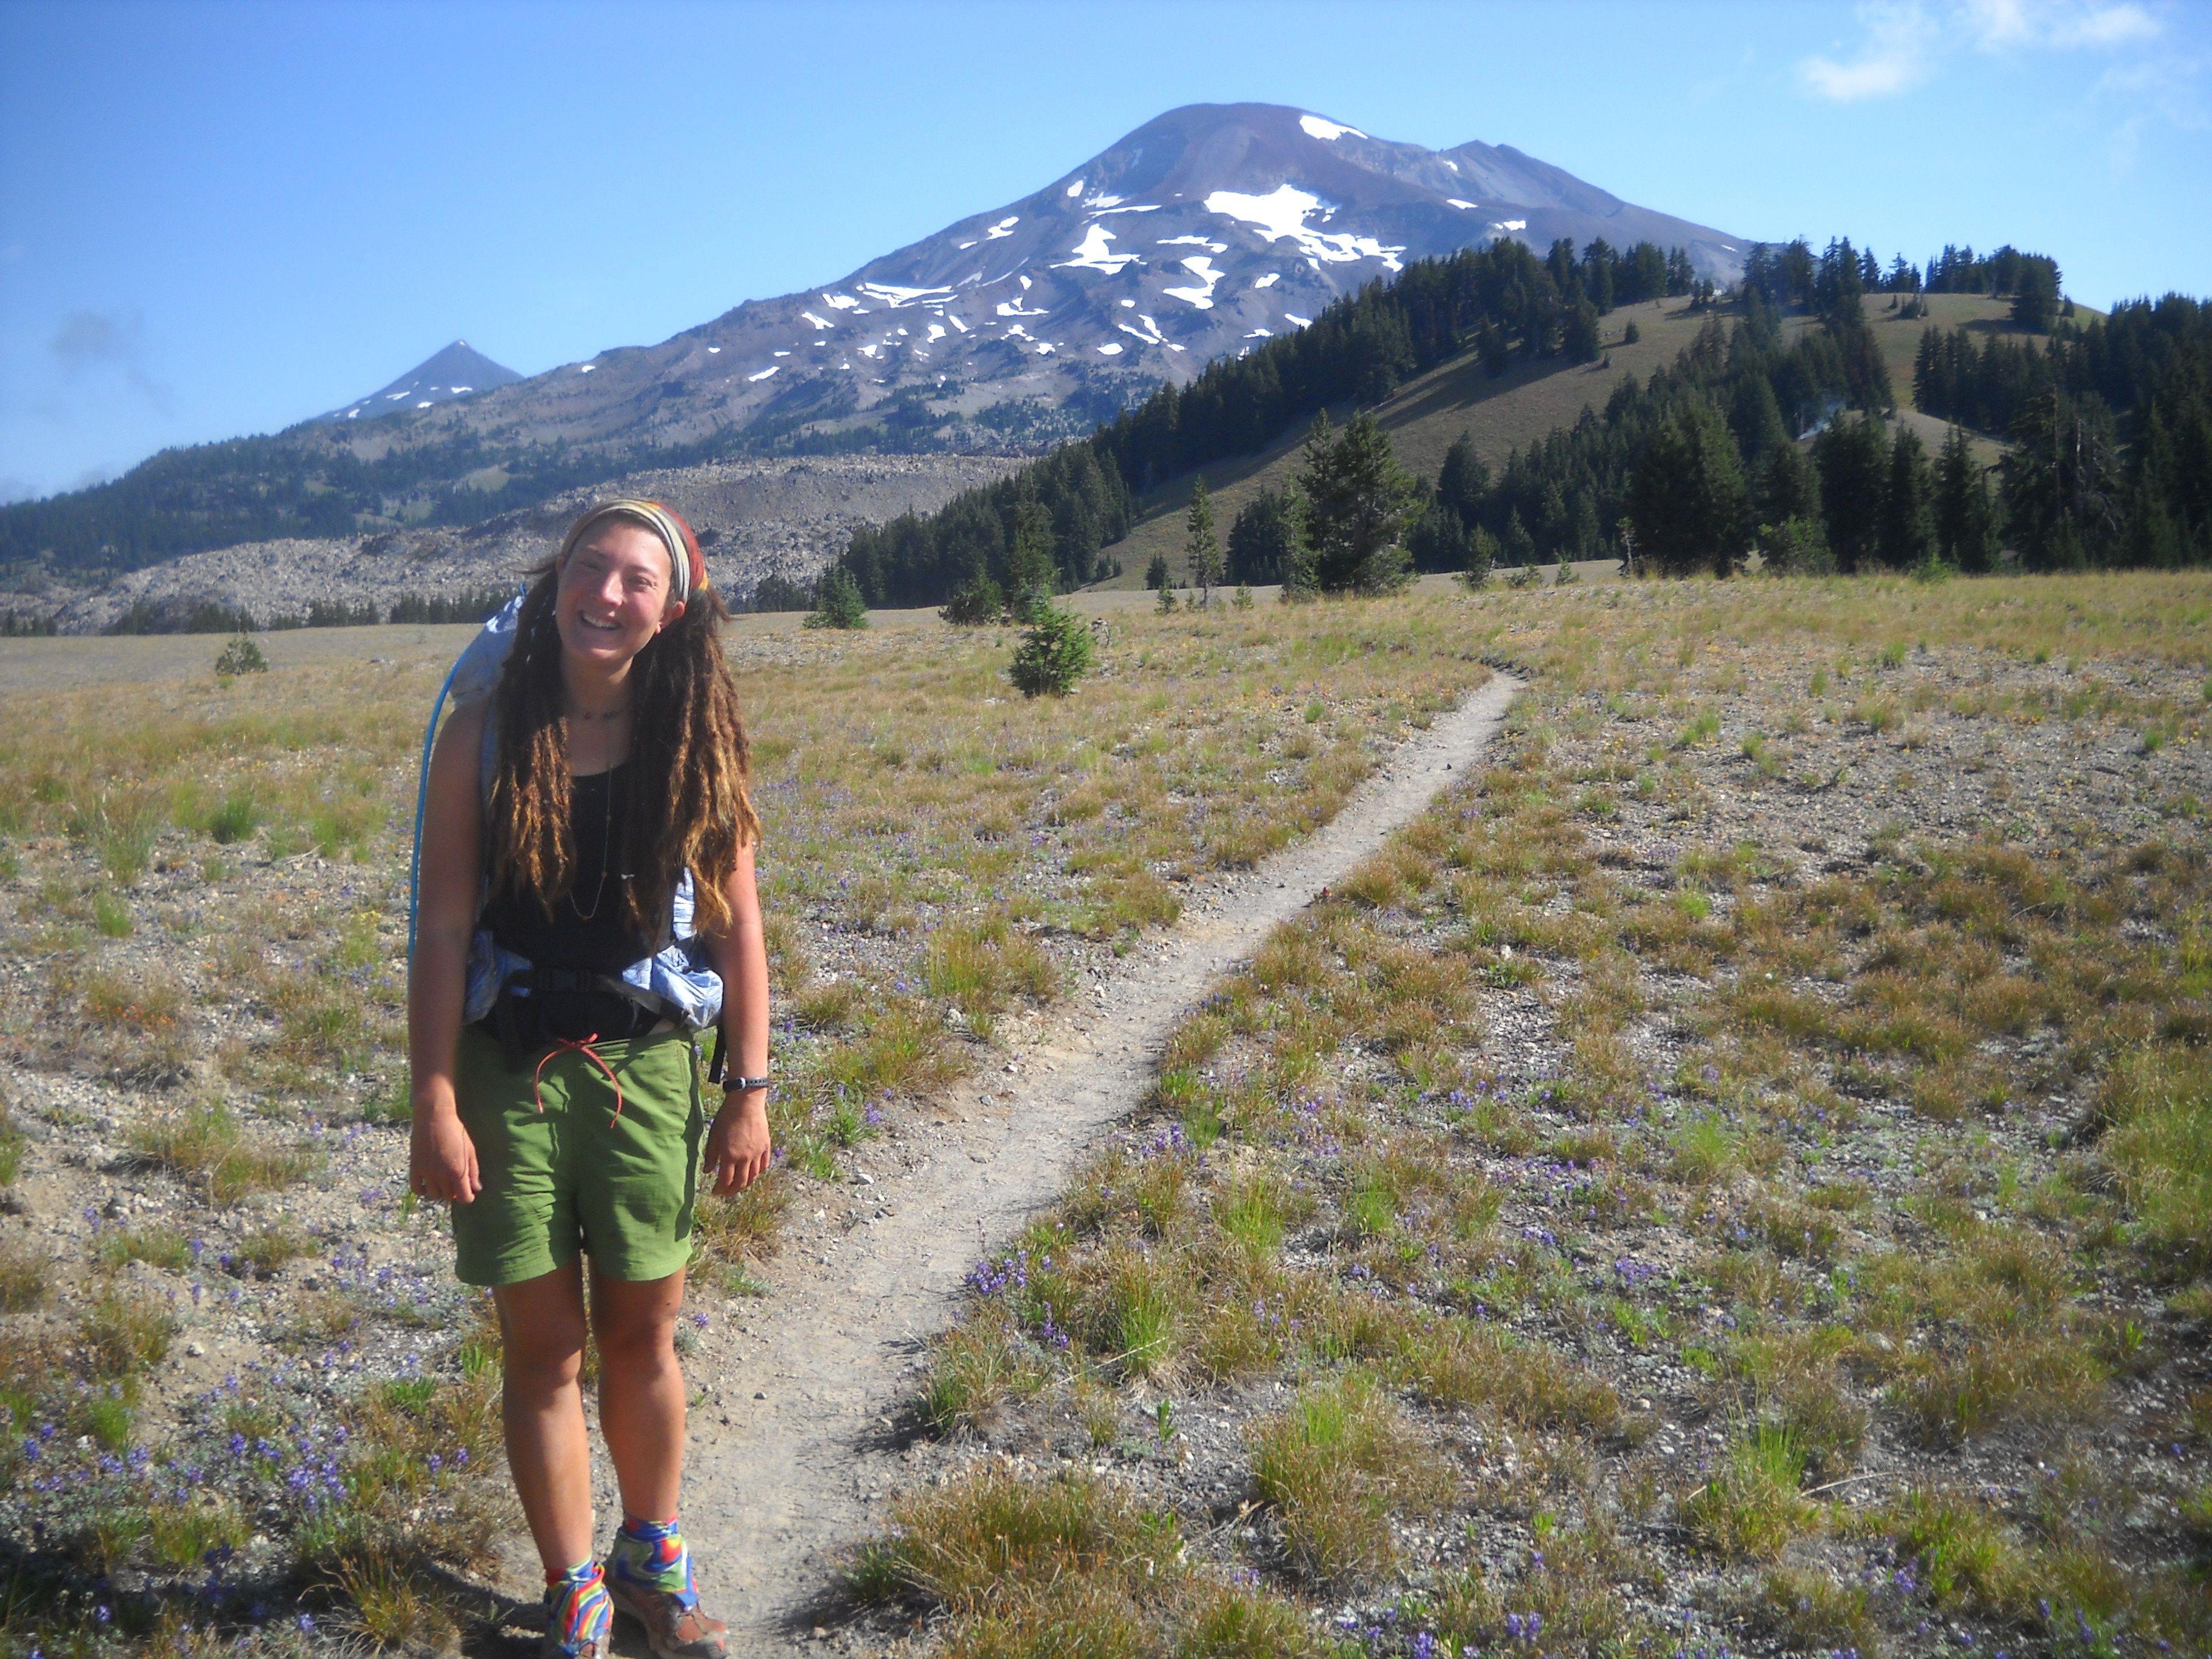 Pacific Crest Trail 2009 Liz Thomas Adventure Hiking